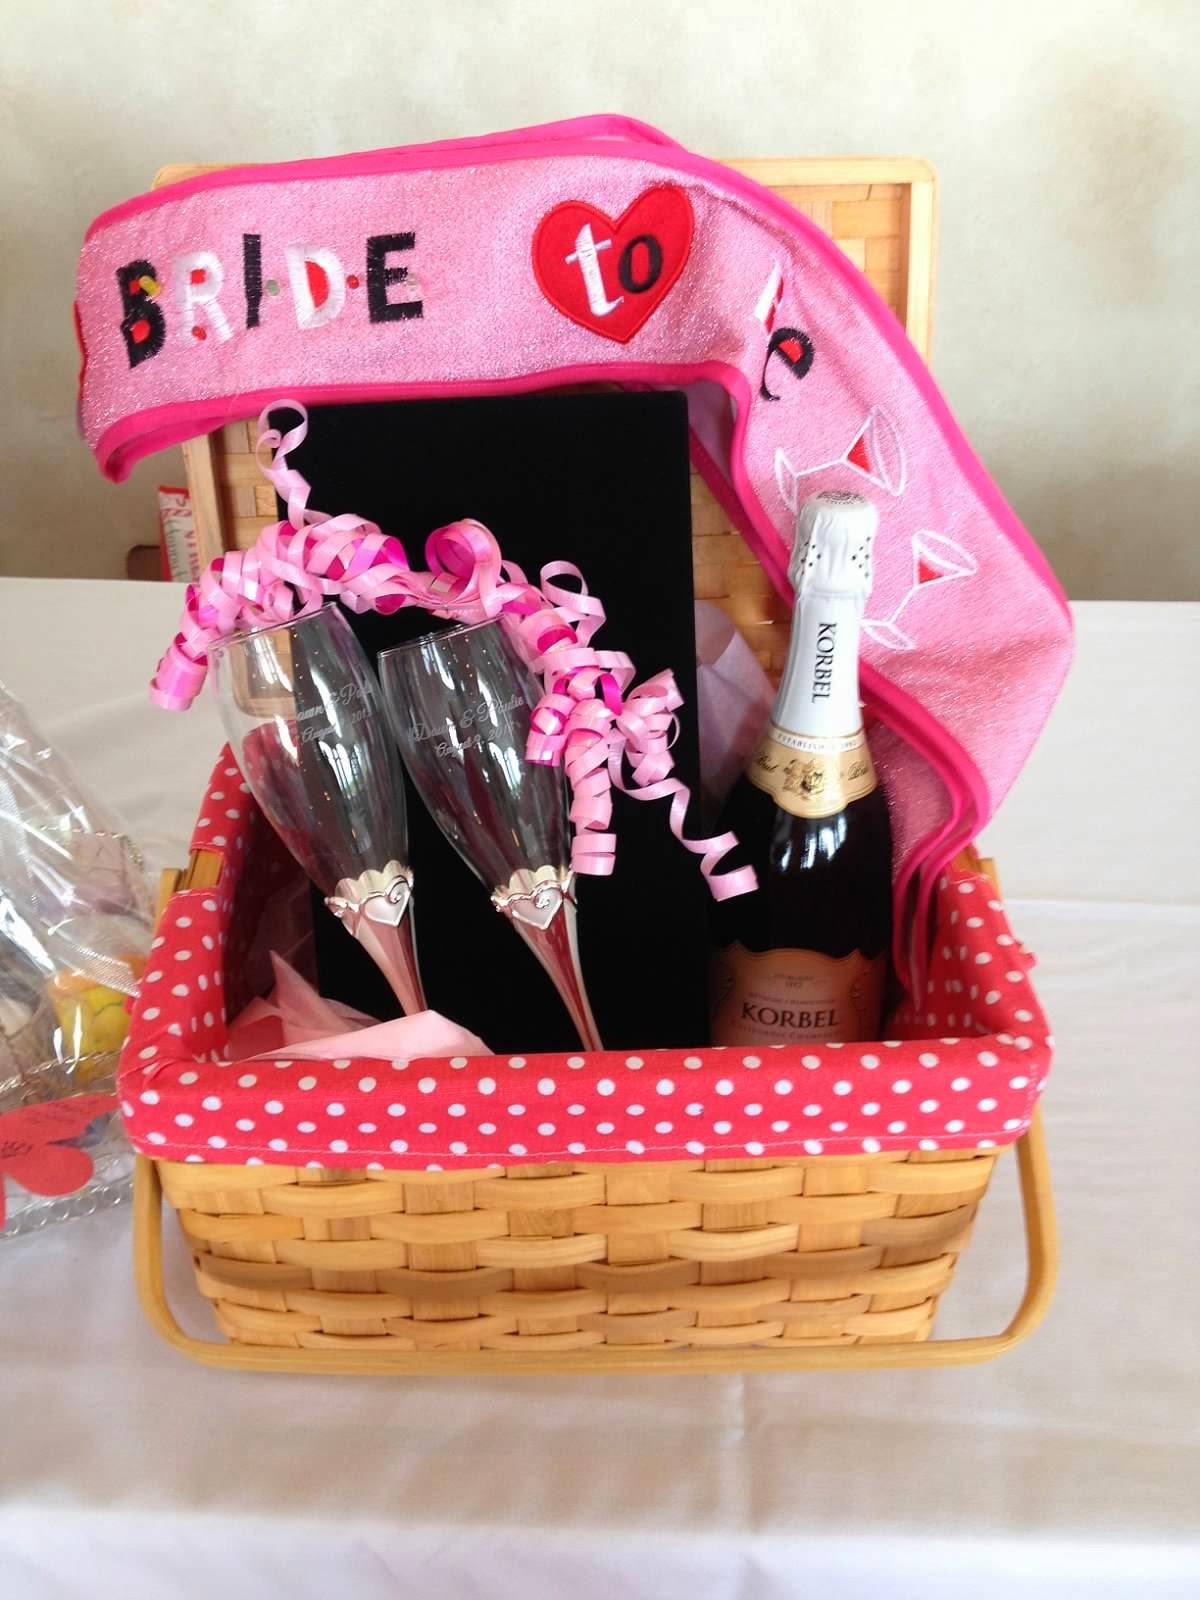 Bridal Gift Basket Ideas  2 Girls 1 Year 730 Moments to Wedding Wednesdays